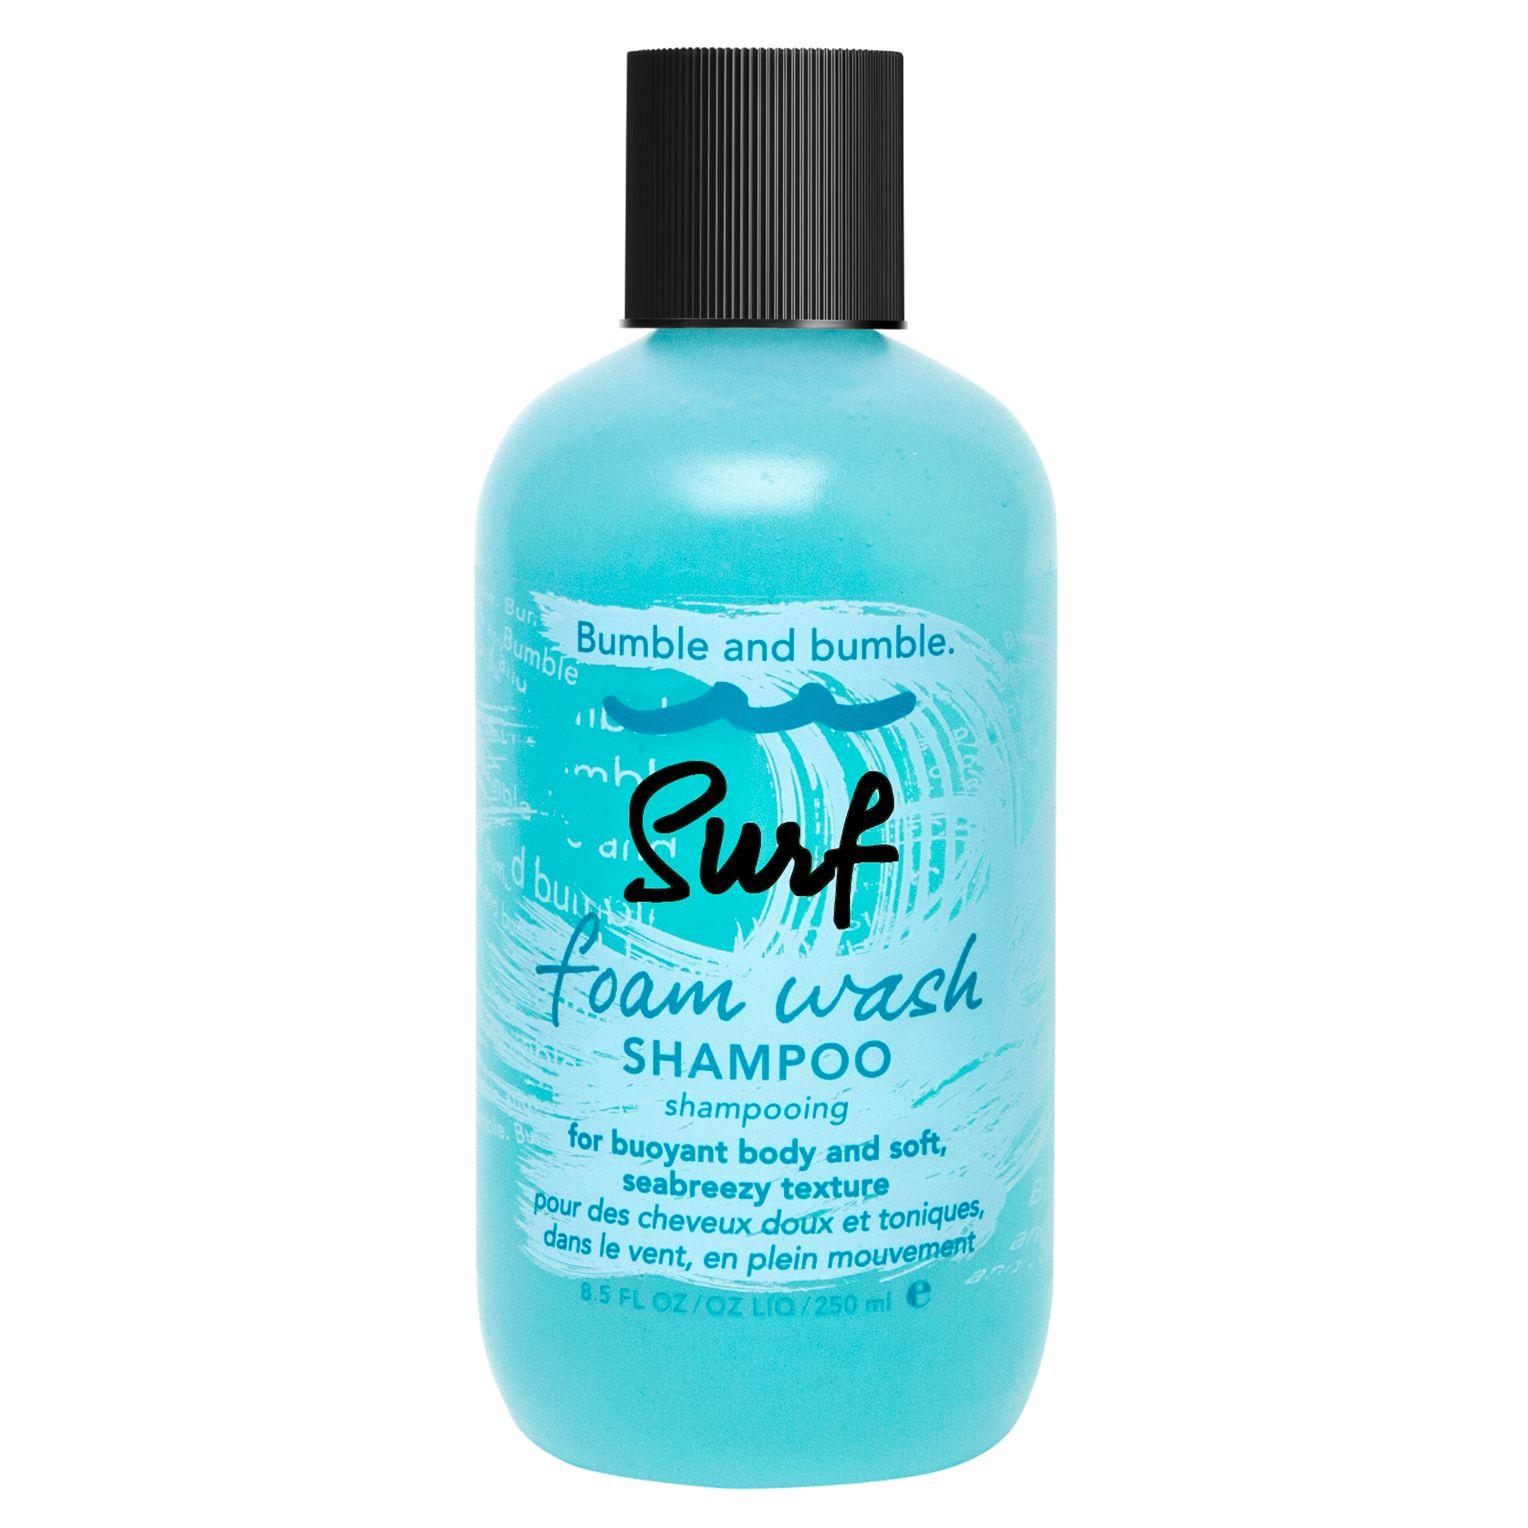 Bumble and bumble Bumble and bumble Surf Foam Wash Shampoo, 250ml